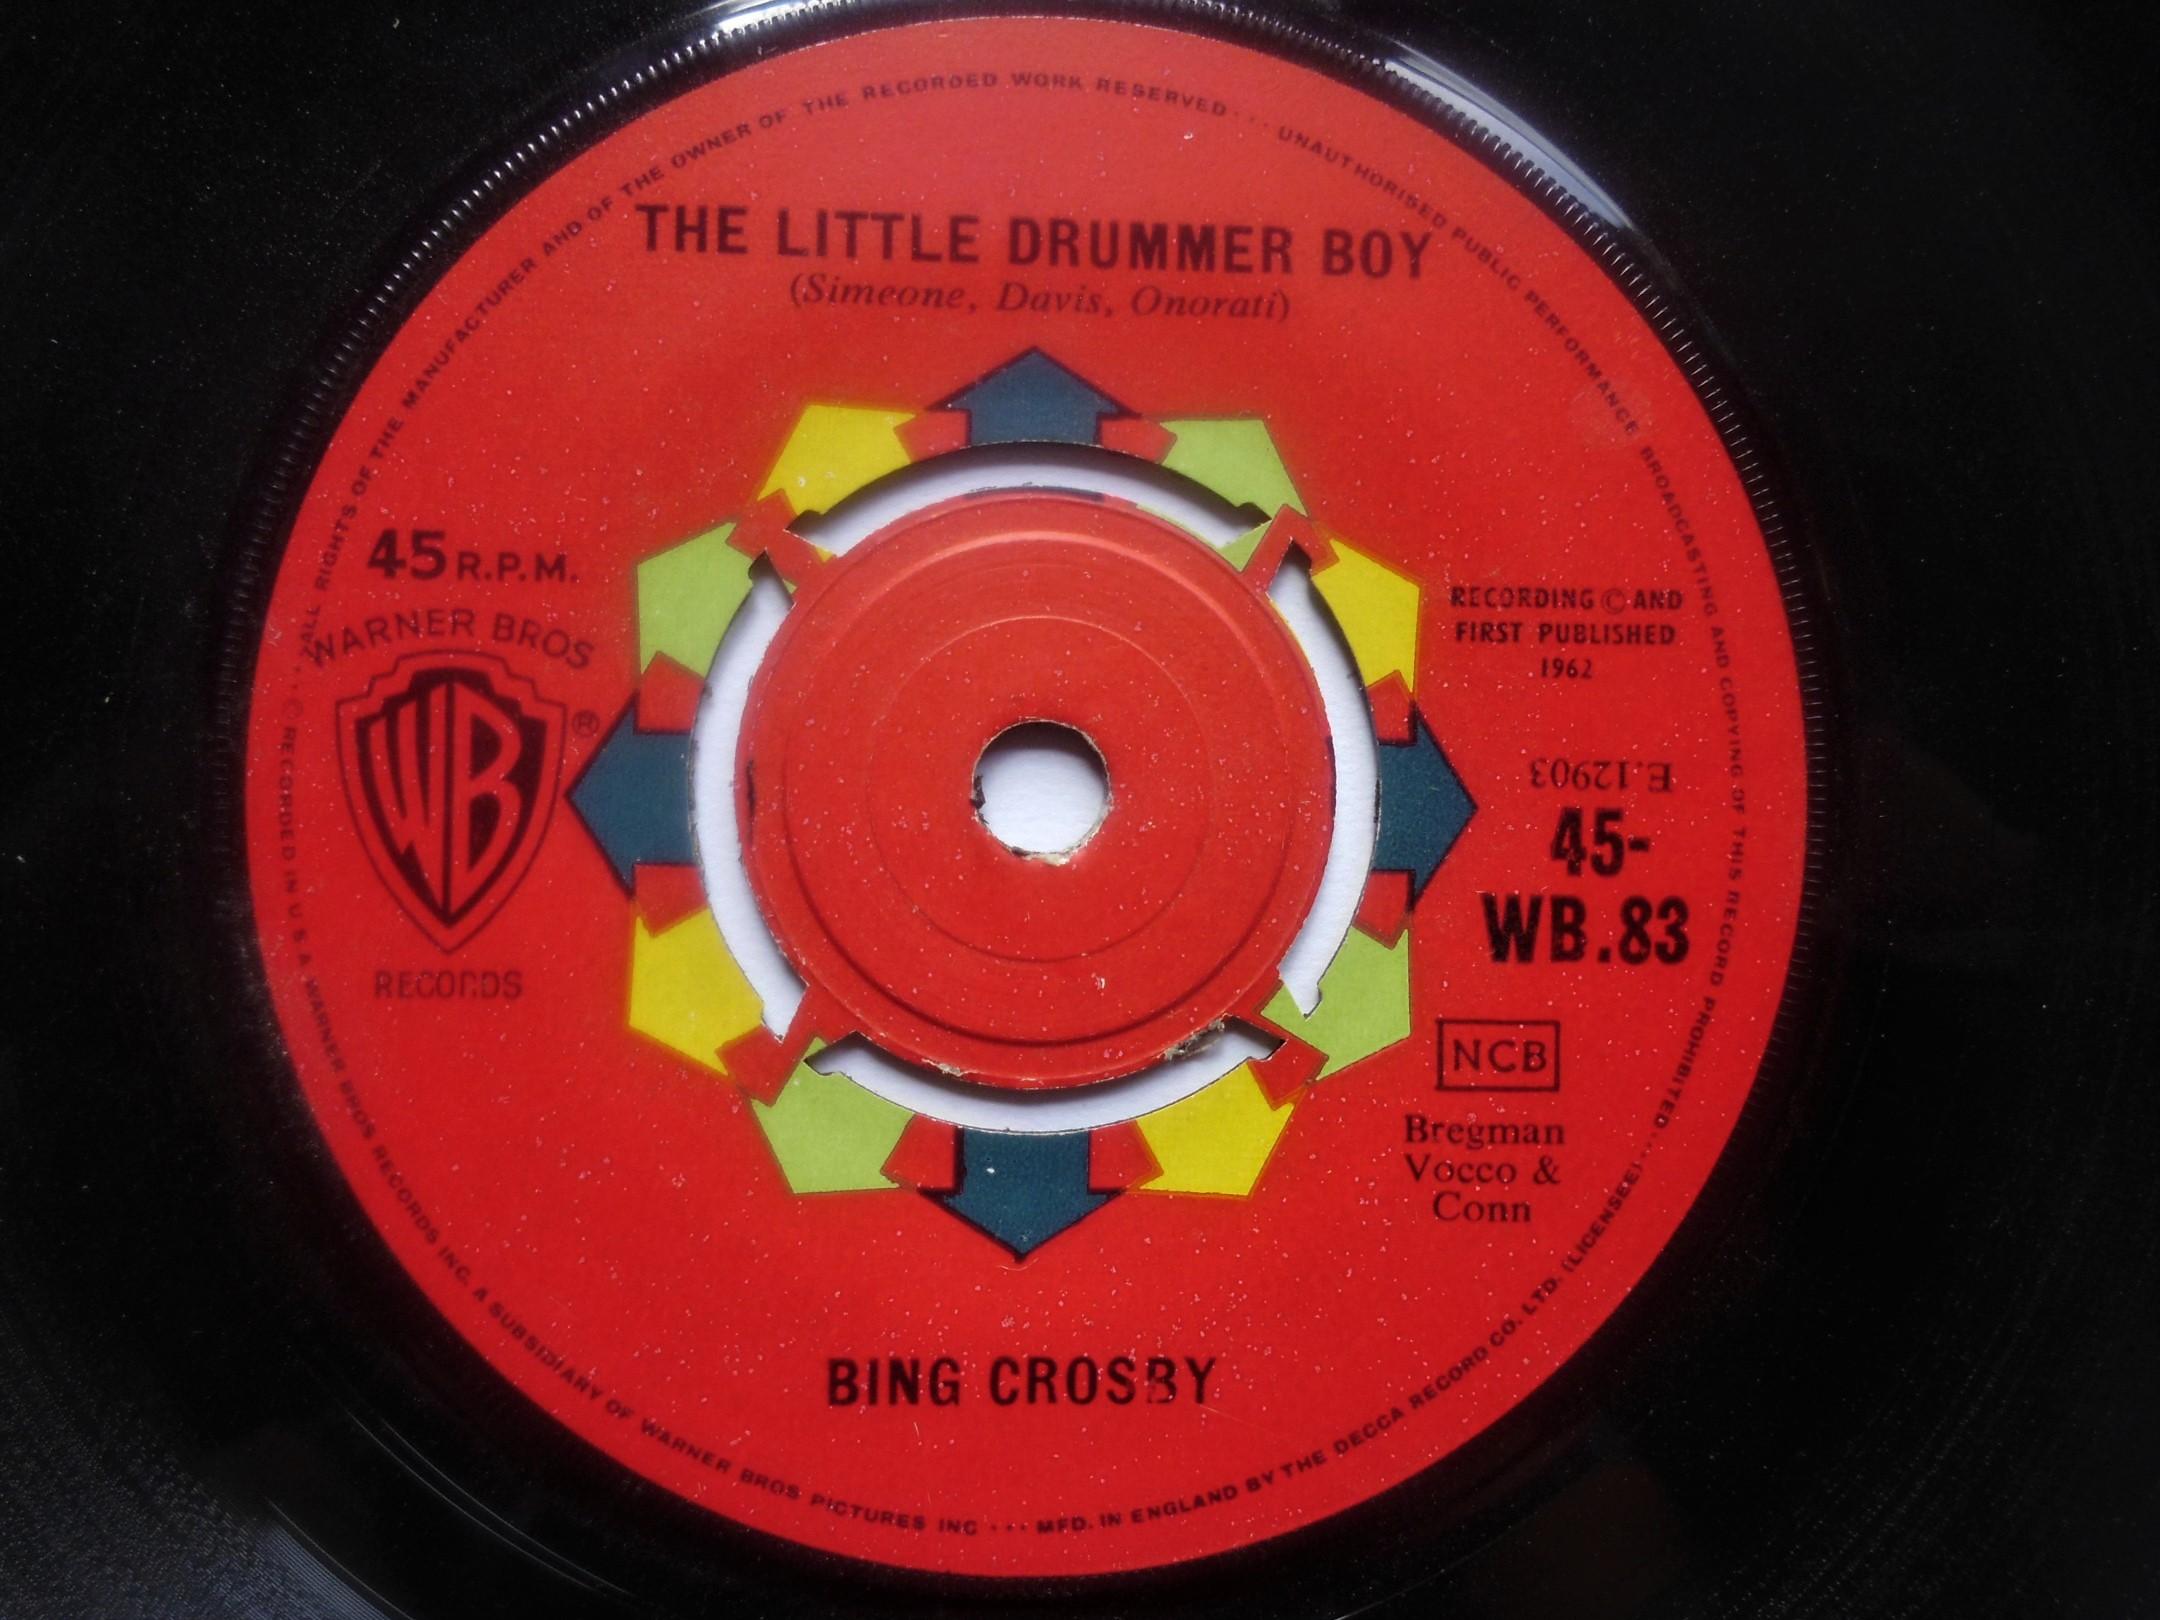 bing crosby the little drummer boyi wish you a merry christmas - Bing Crosby I Wish You A Merry Christmas